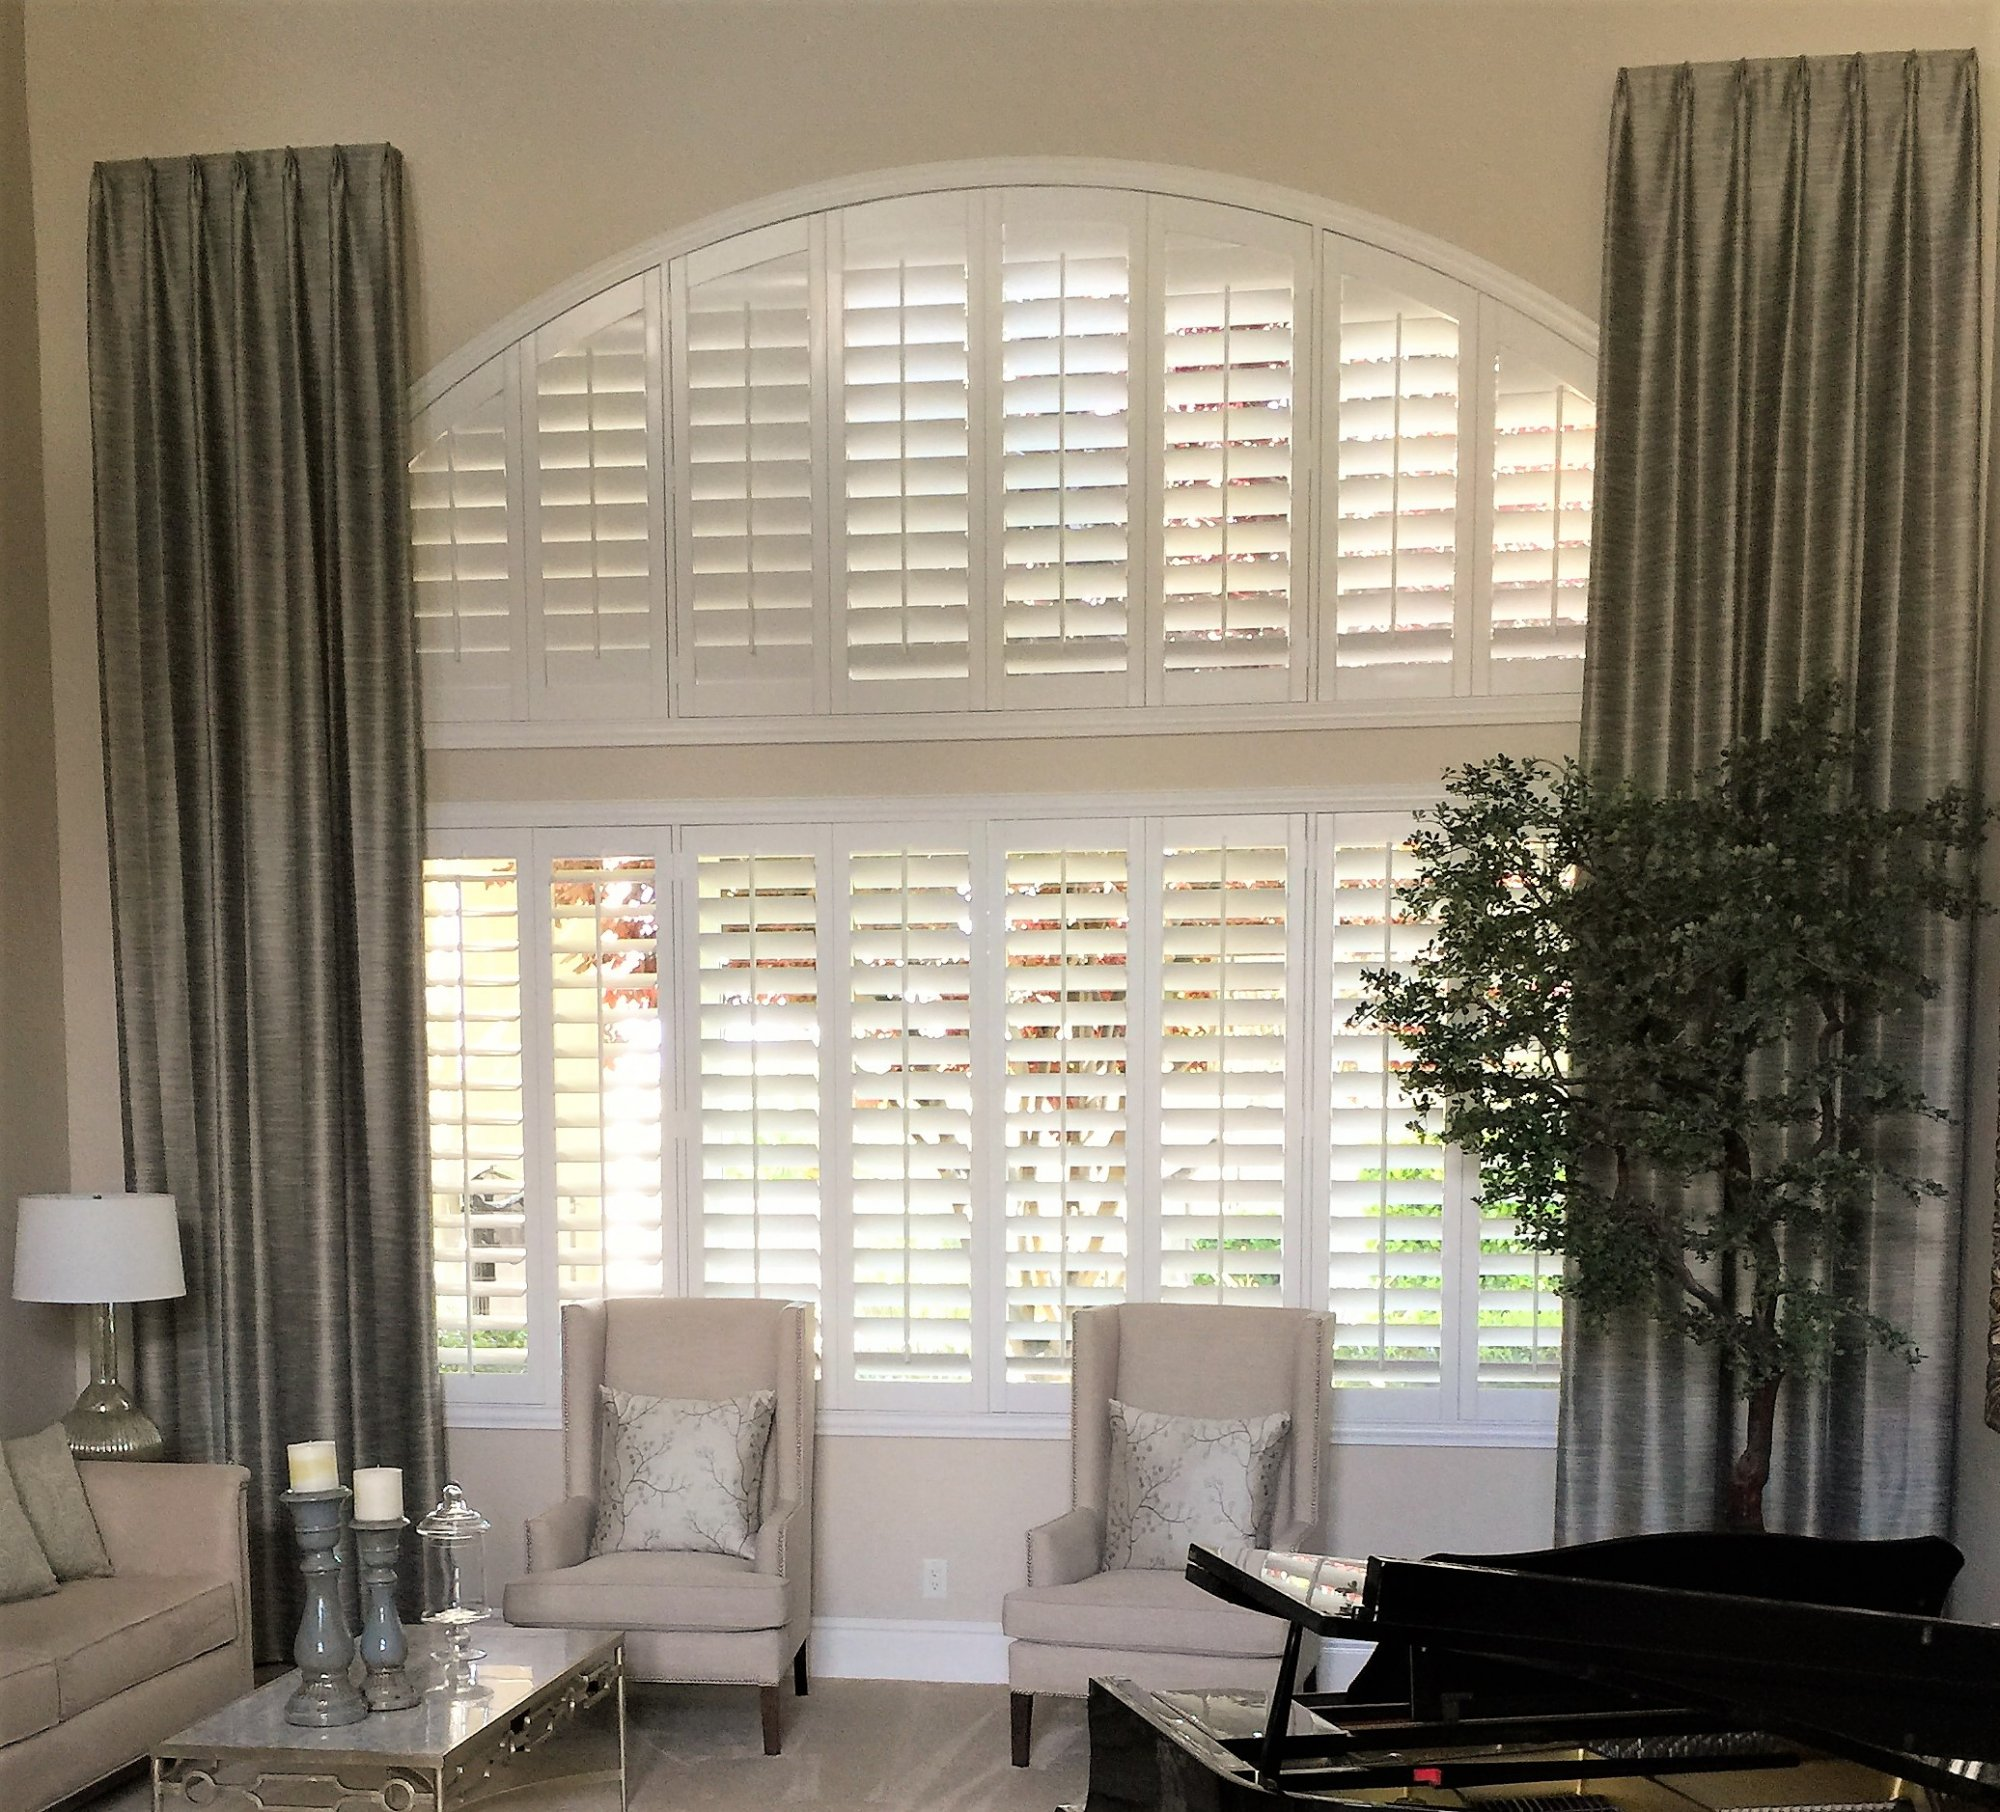 sunburst shutters thank you for visiting the sunburst ocala page, where we offer premium TLVZEYU